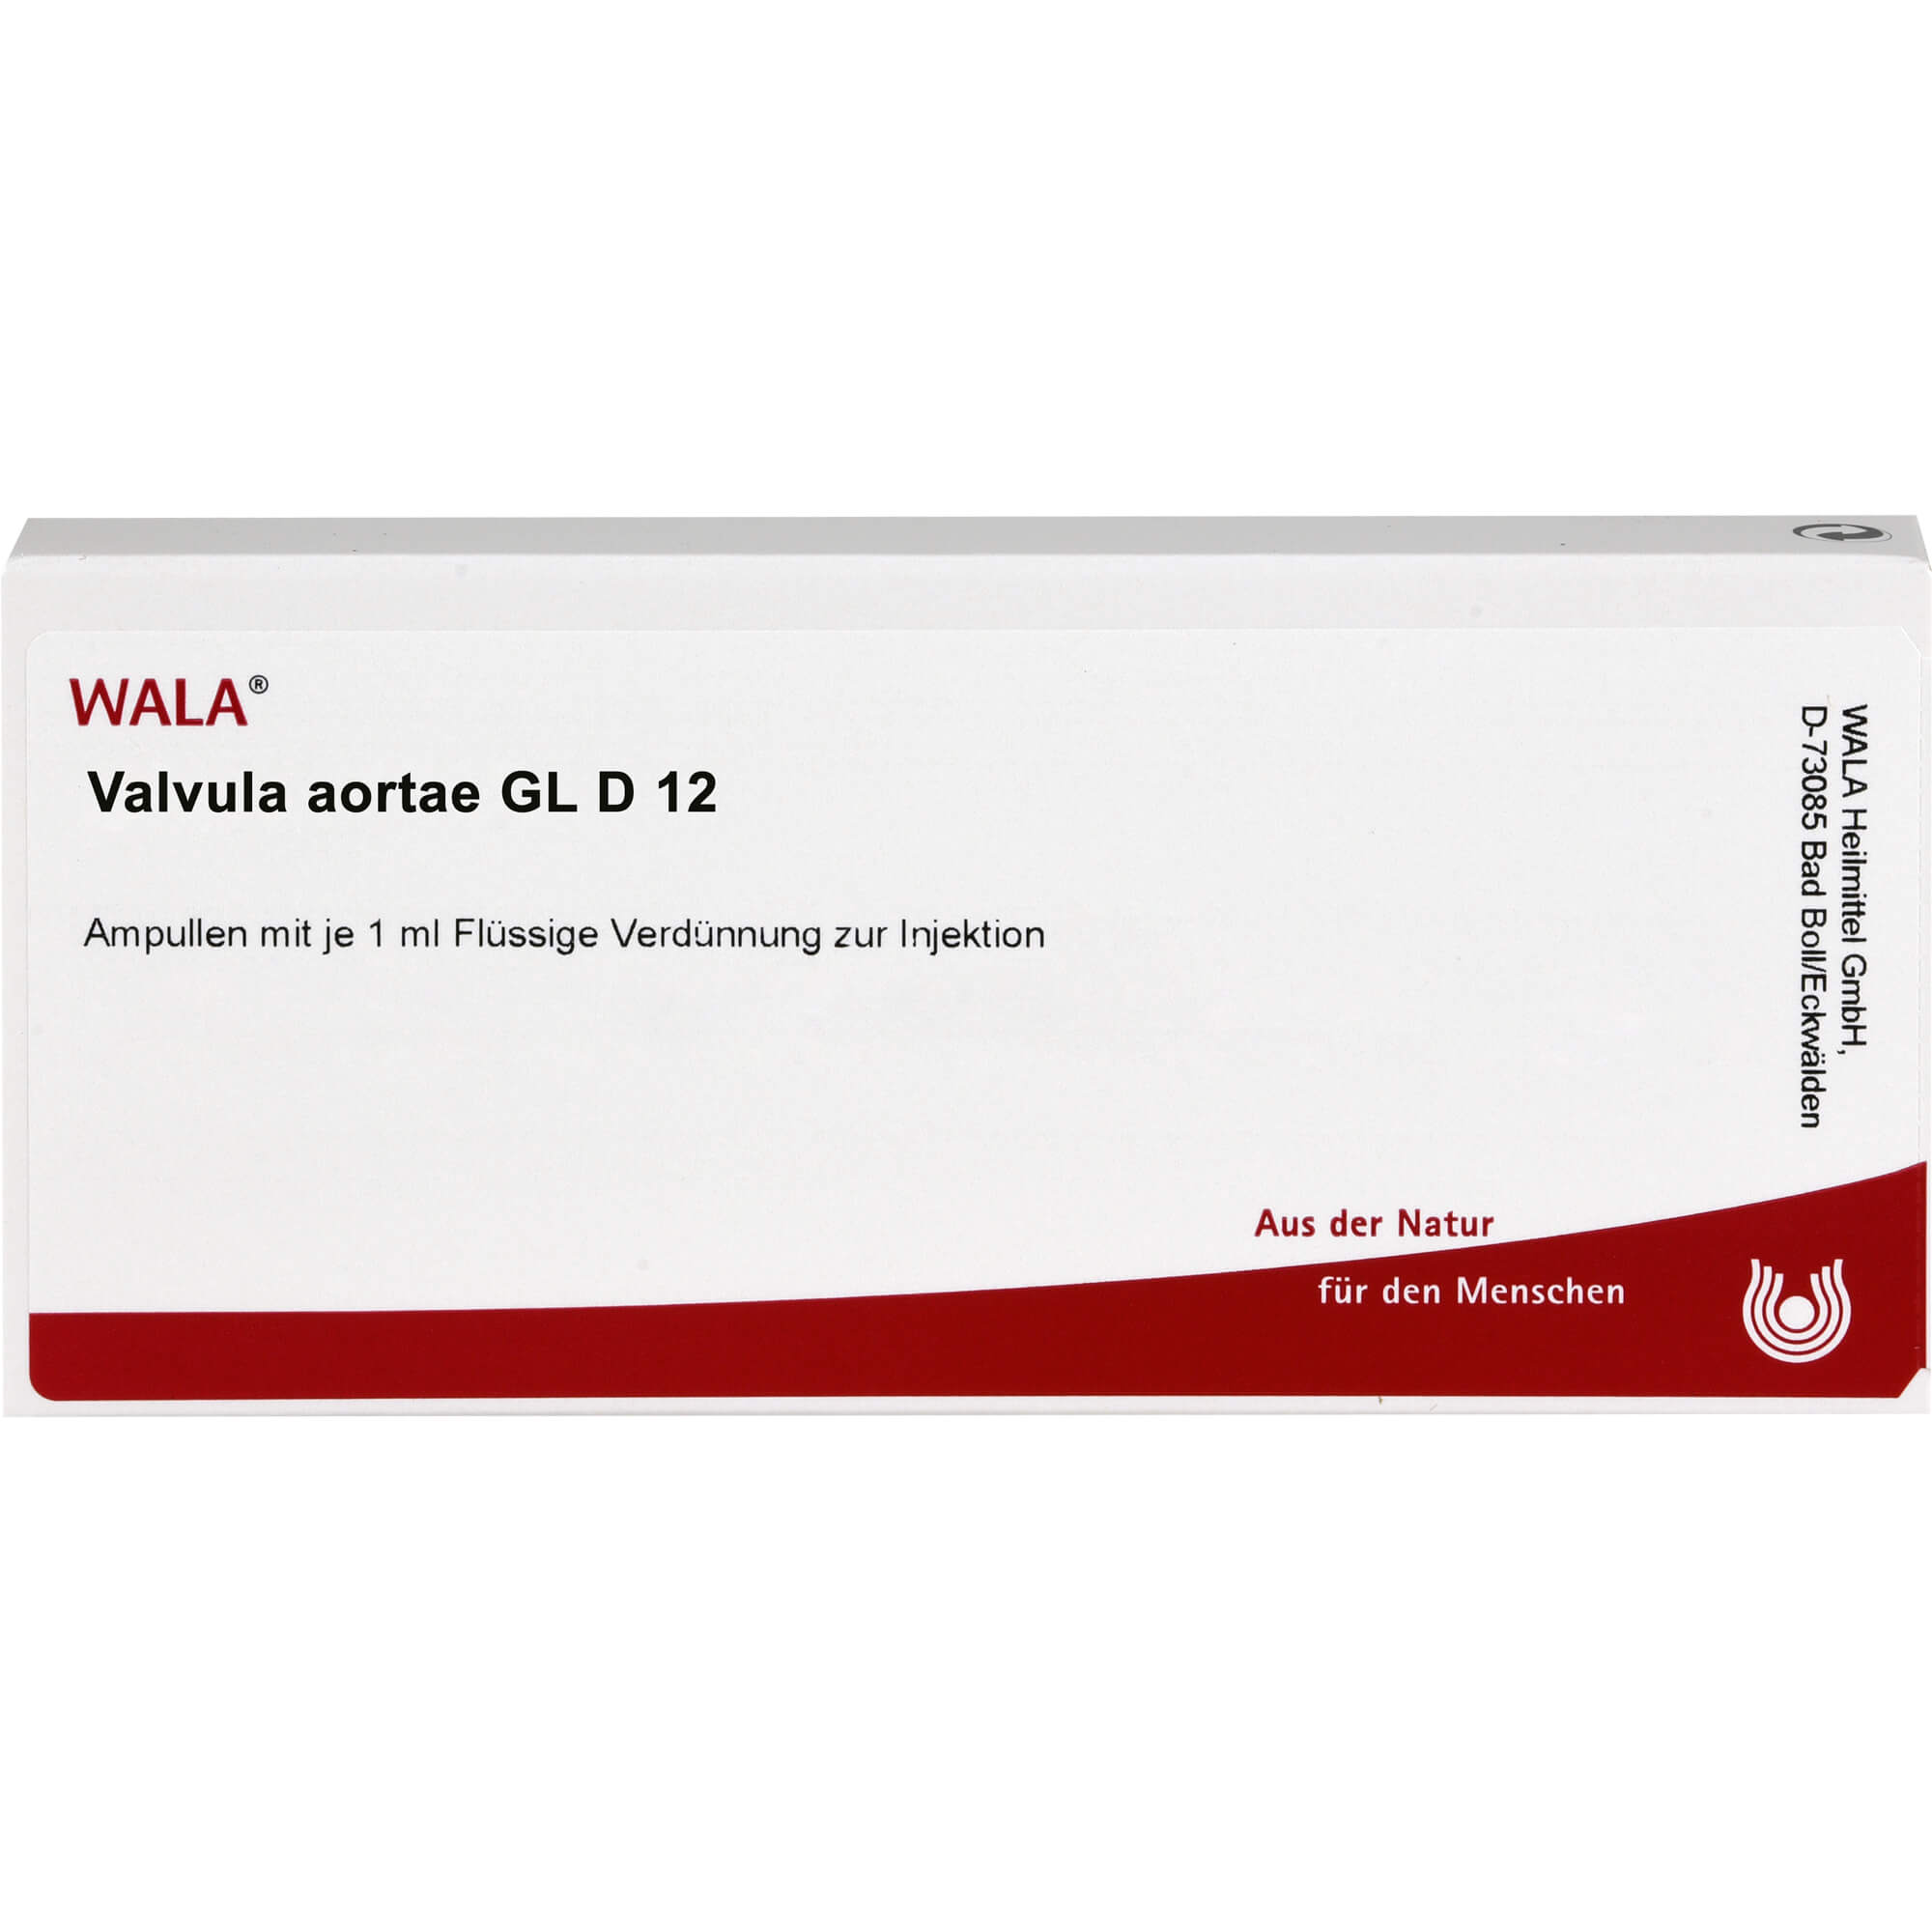 VALVULA aortae GL D 12 Ampullen